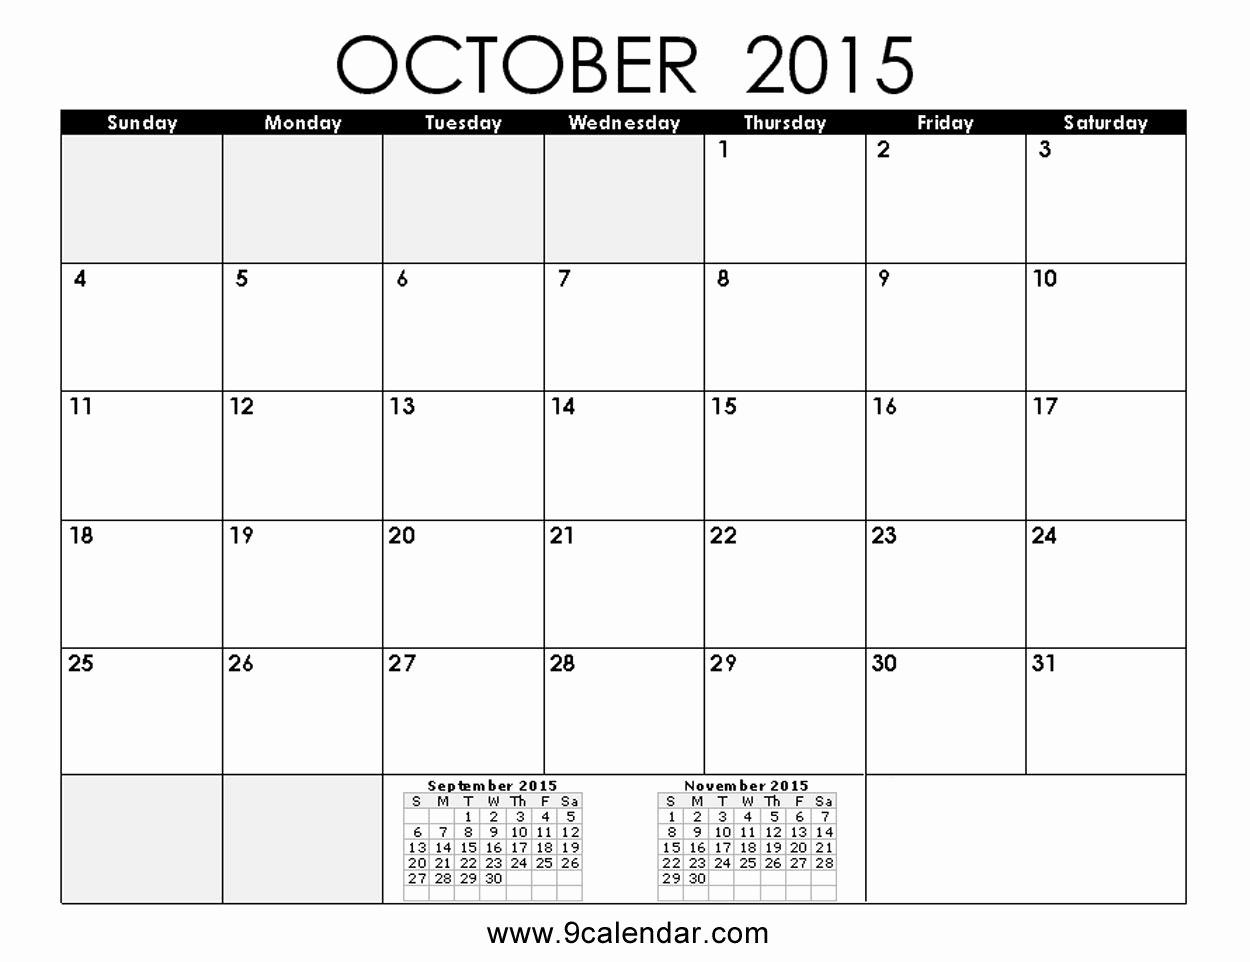 Free Calendar Templates August 2015 Inspirational October 2015 Calendar Printable